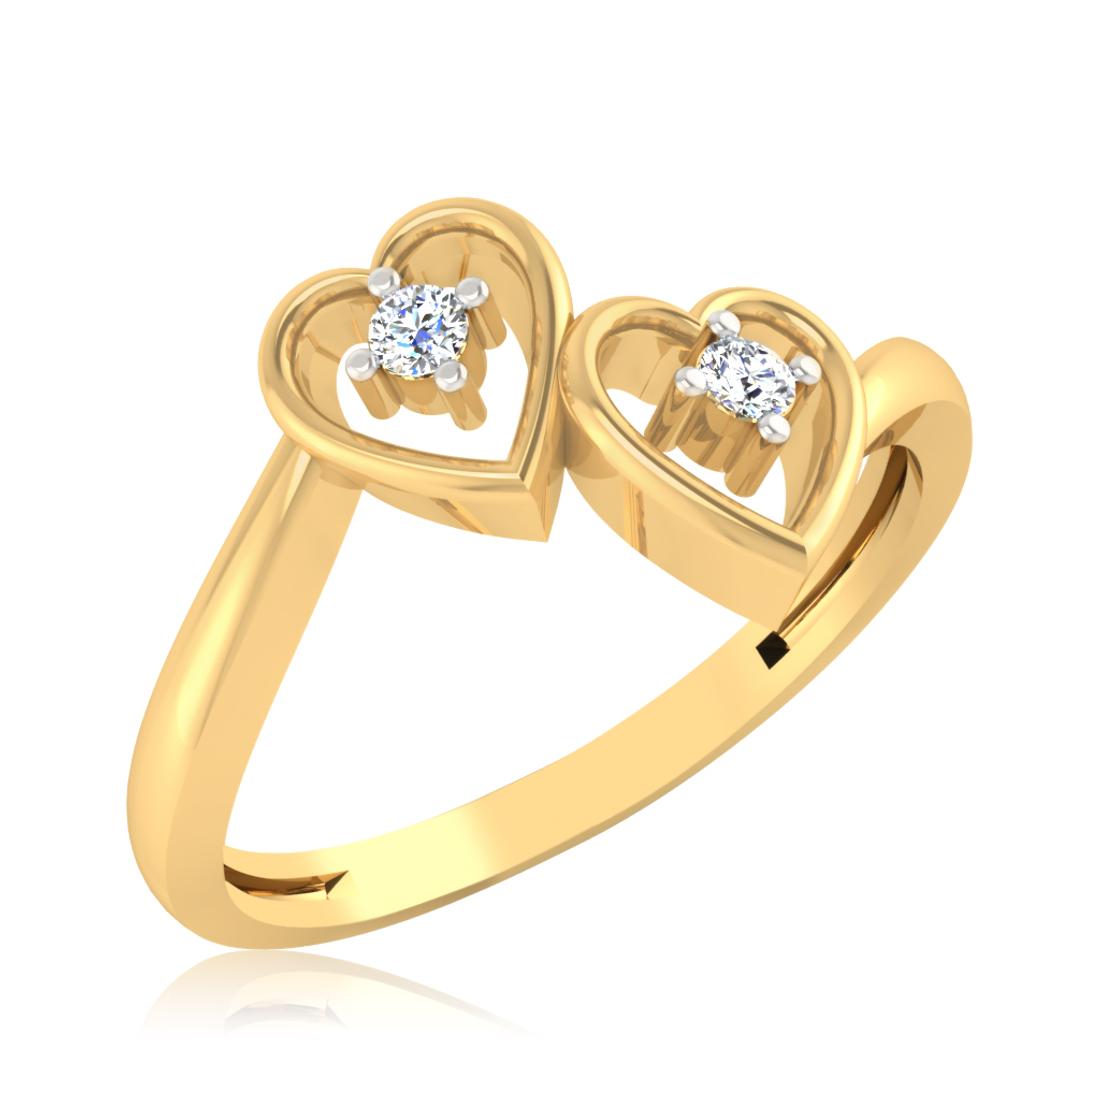 Iski Uski Empress Heart Ring